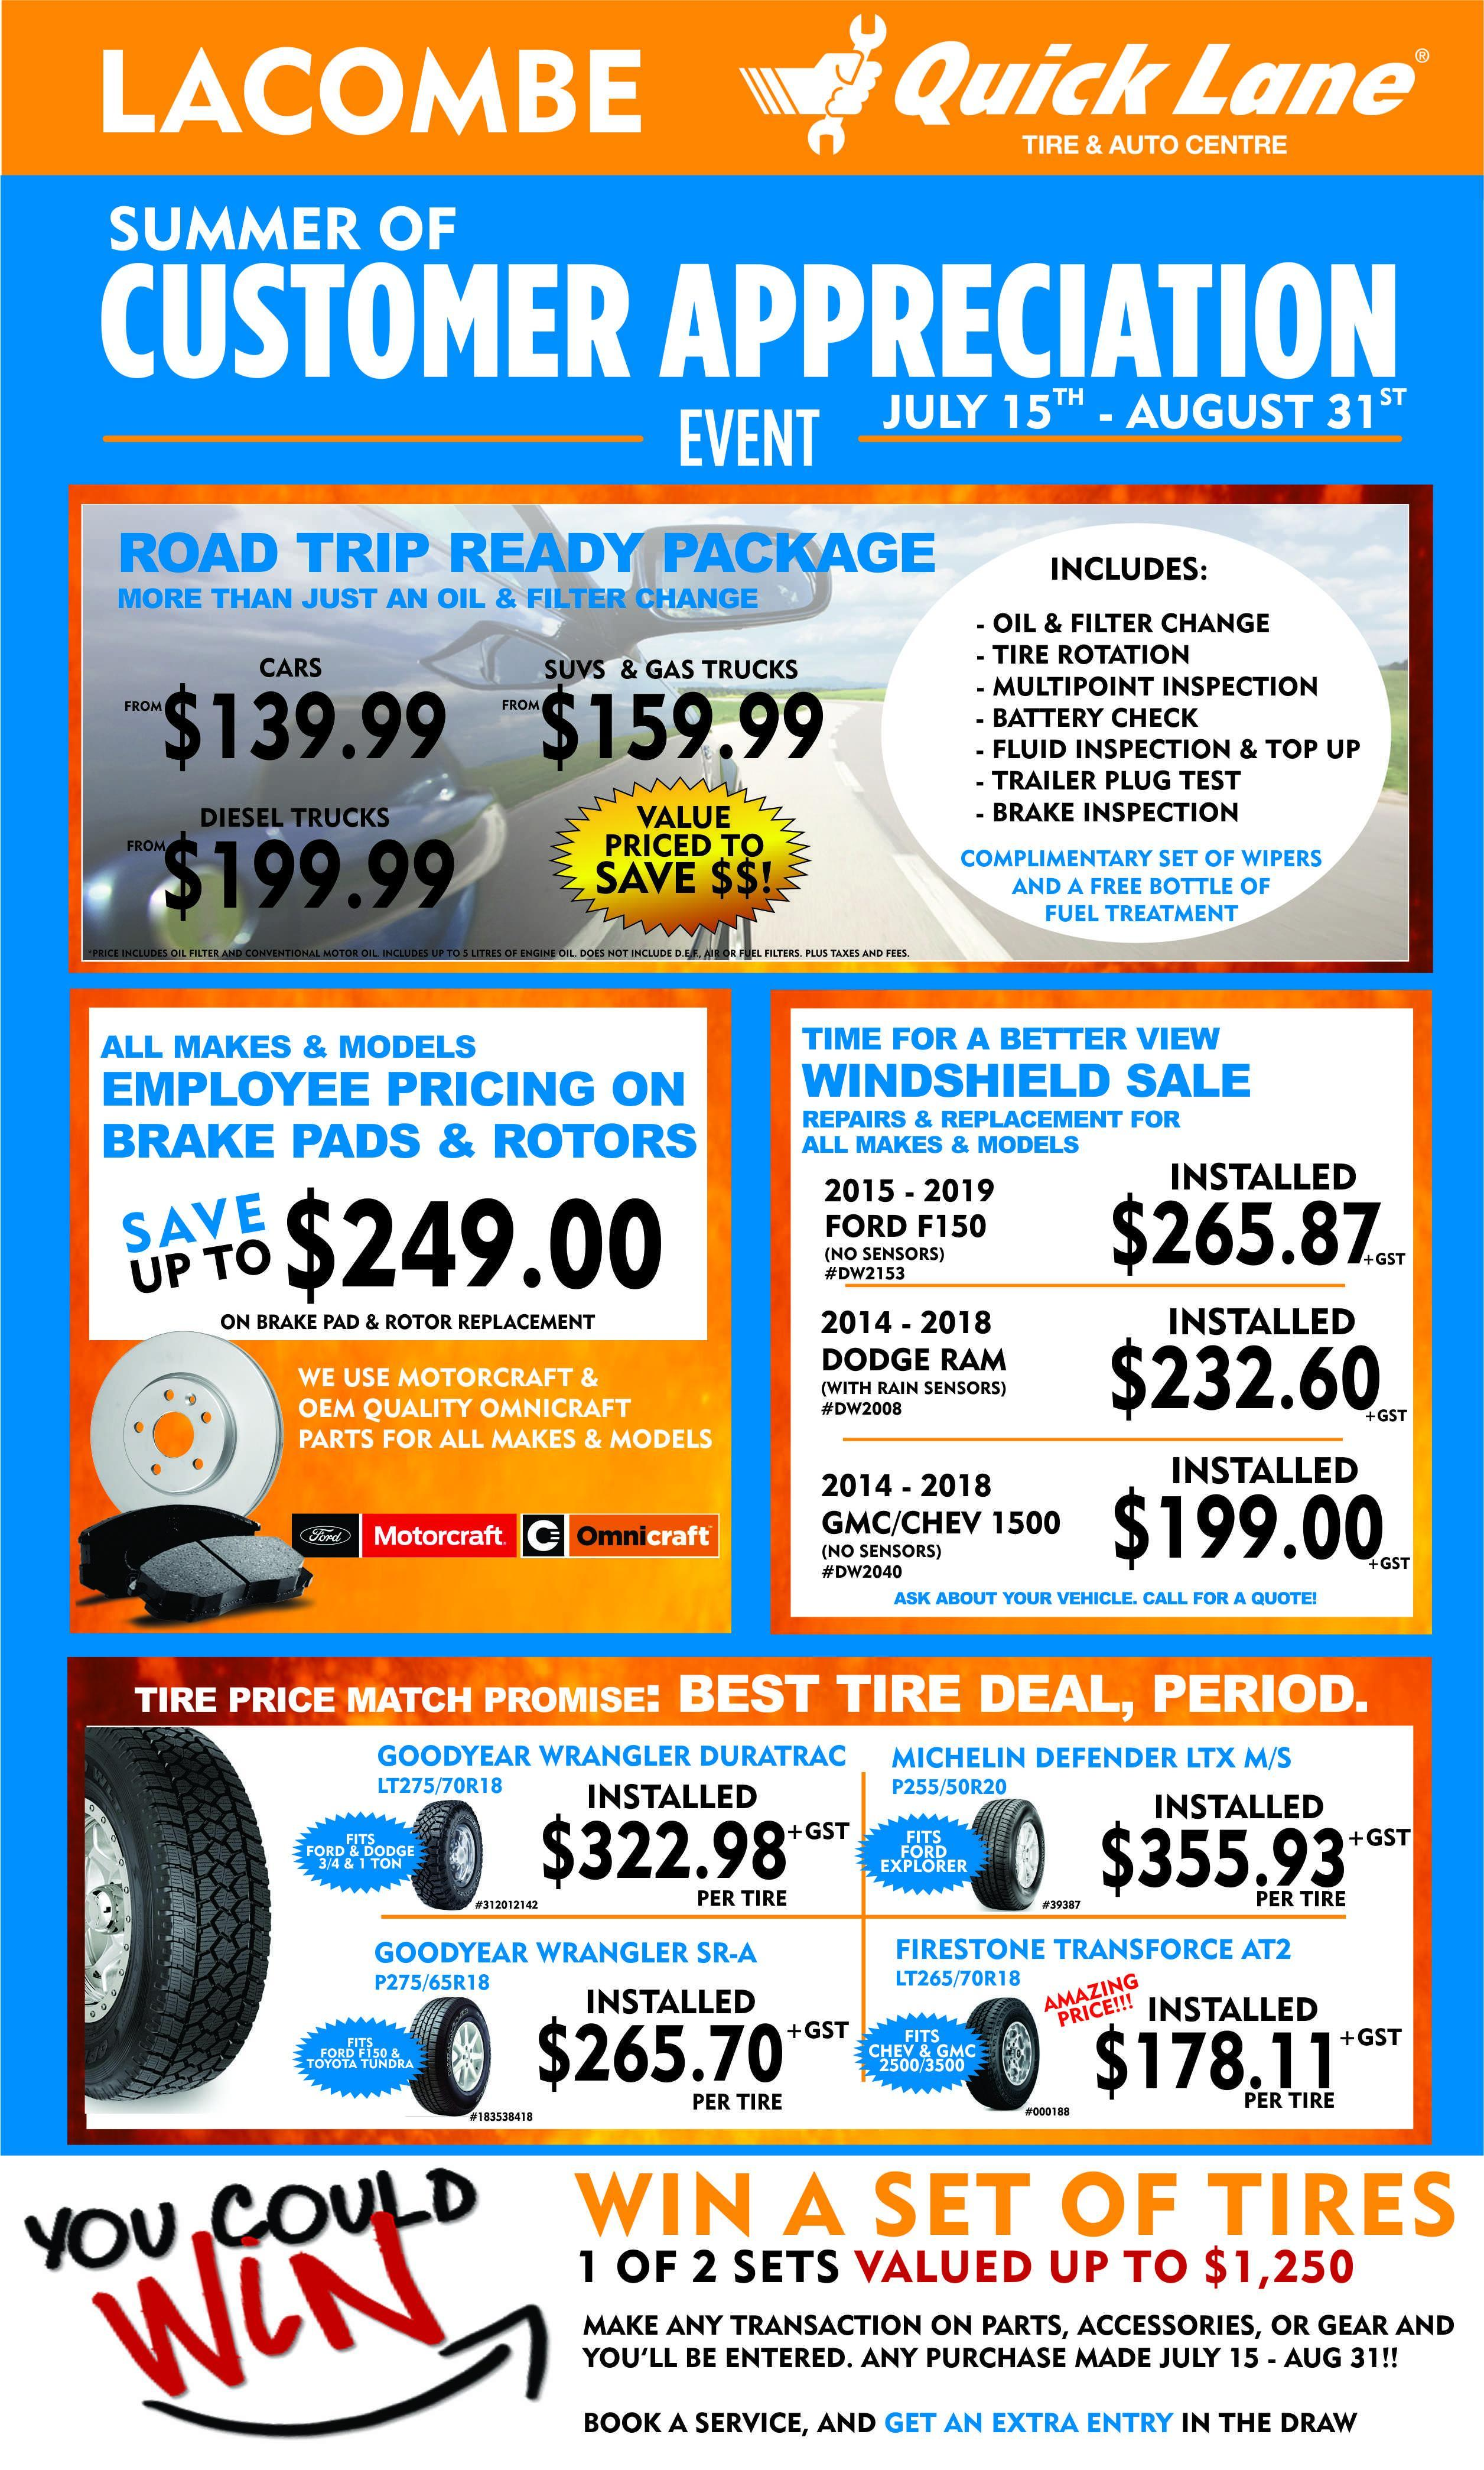 quick lane customer appreciation sale oil change brakes tires lacombe windshields